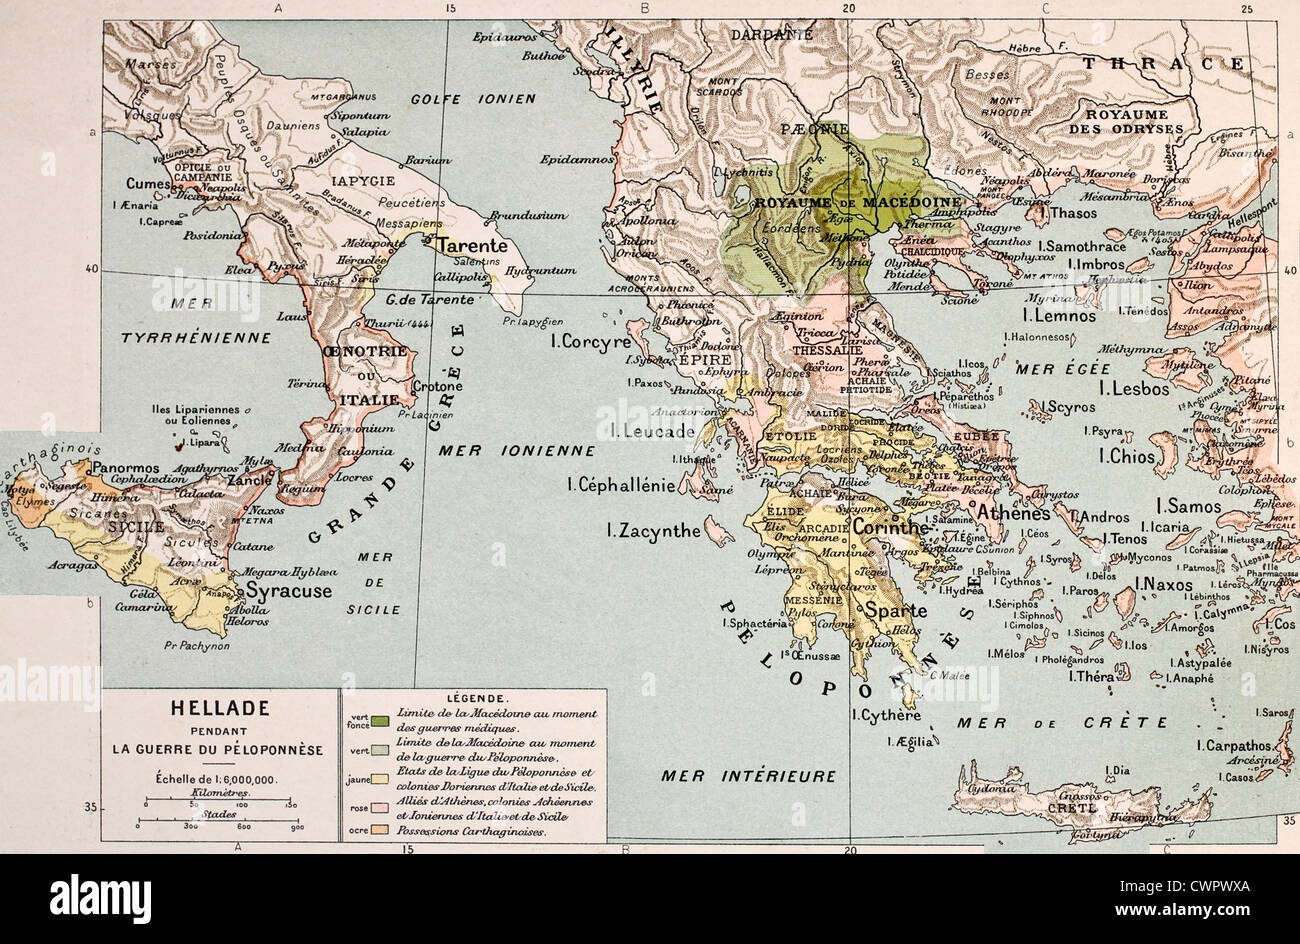 Peloponnes Karte Regionen.Map Of The Peloponnesus Stockfotos Map Of The Peloponnesus Bilder